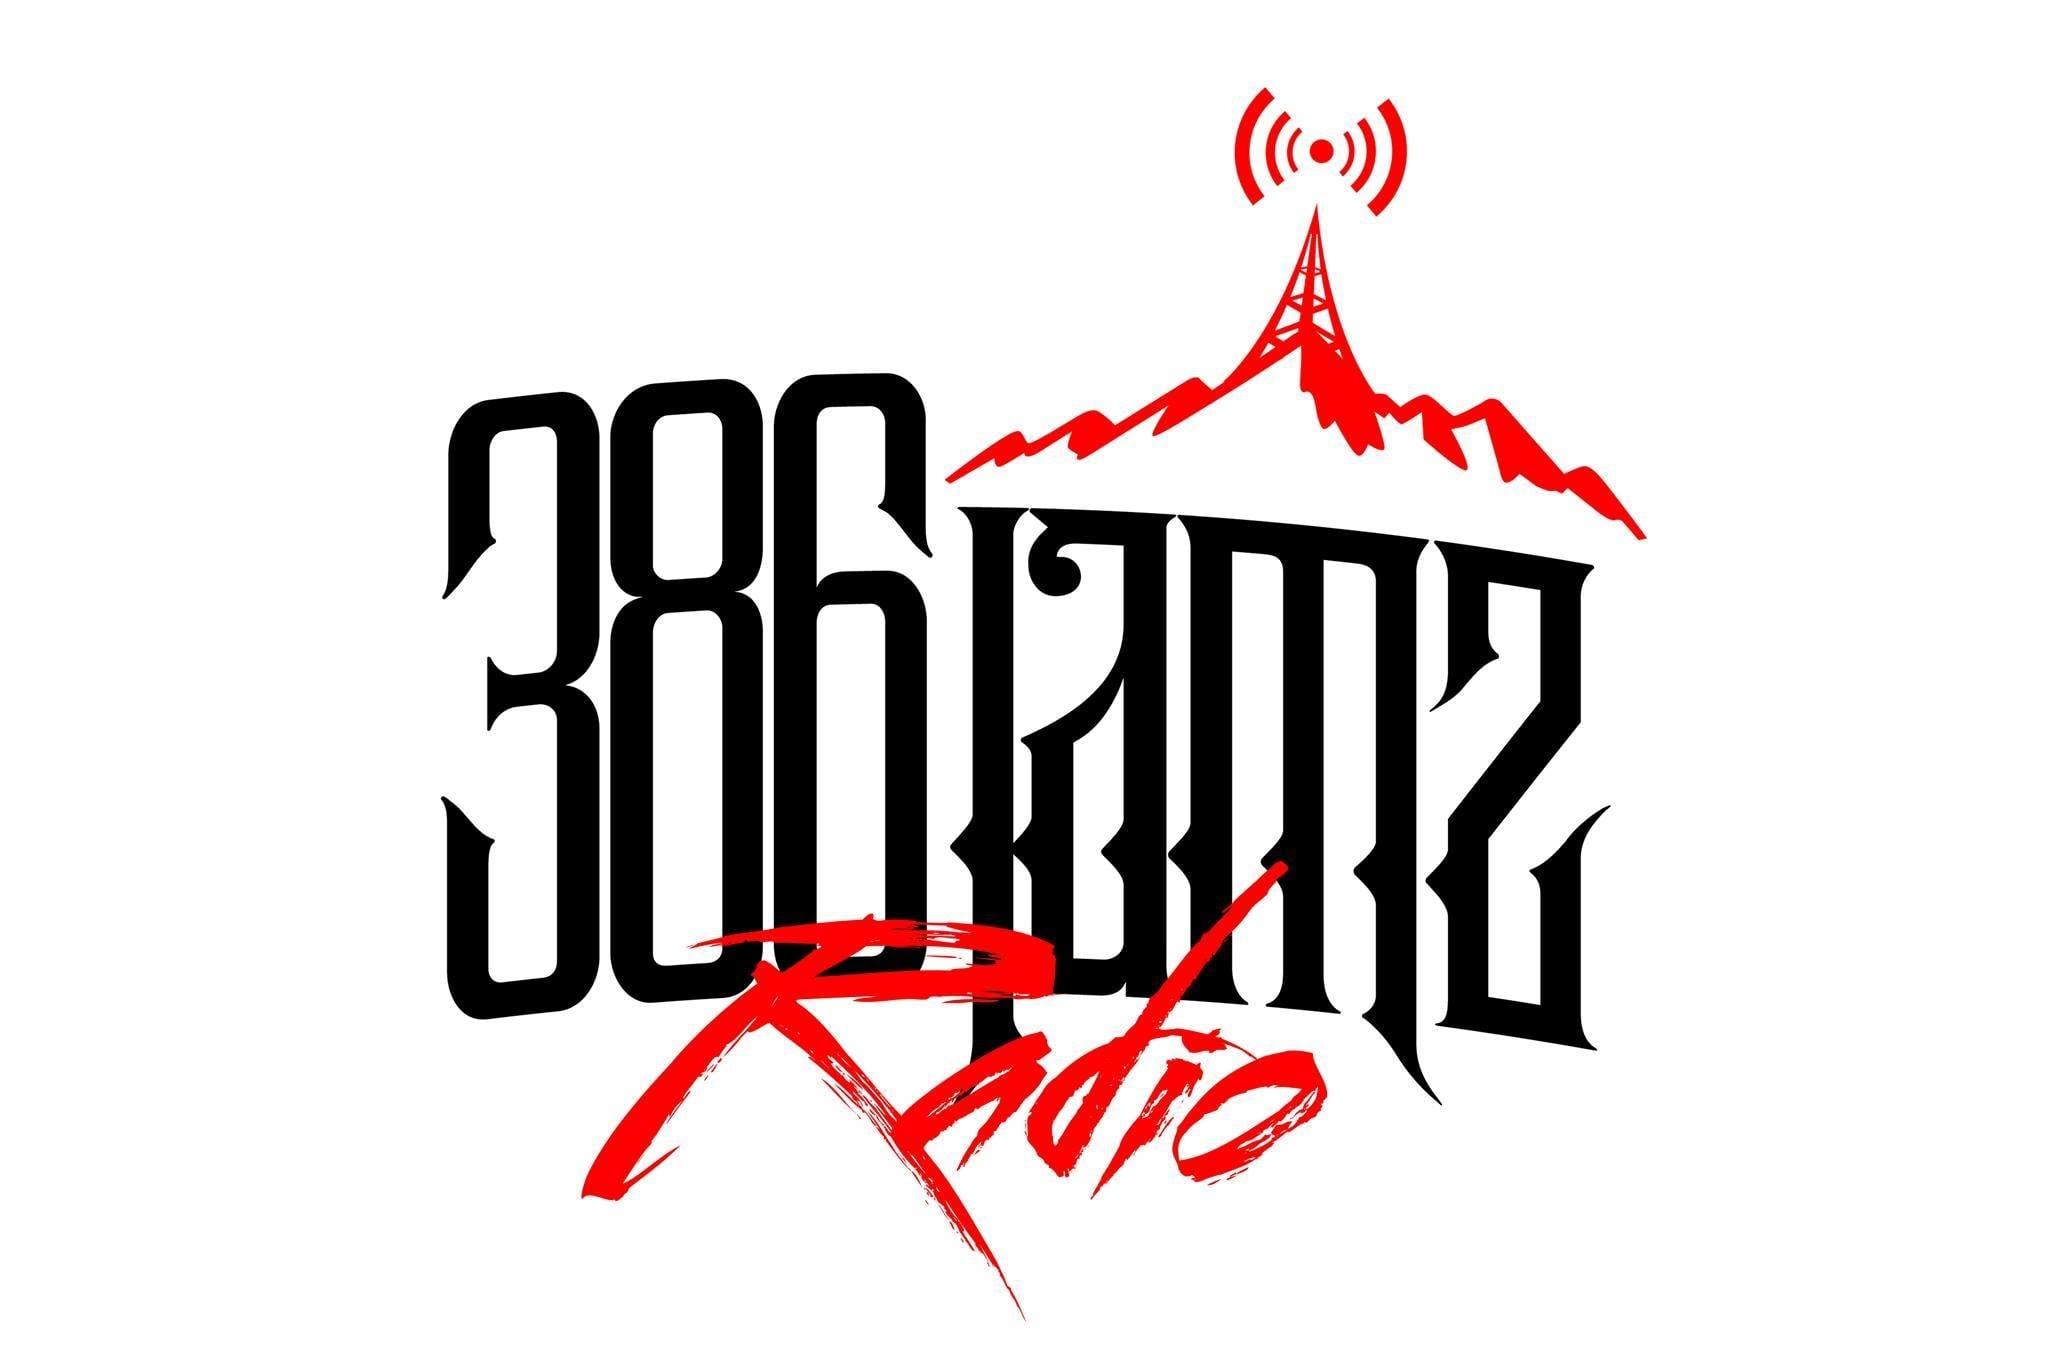 386Jamz Media Llc